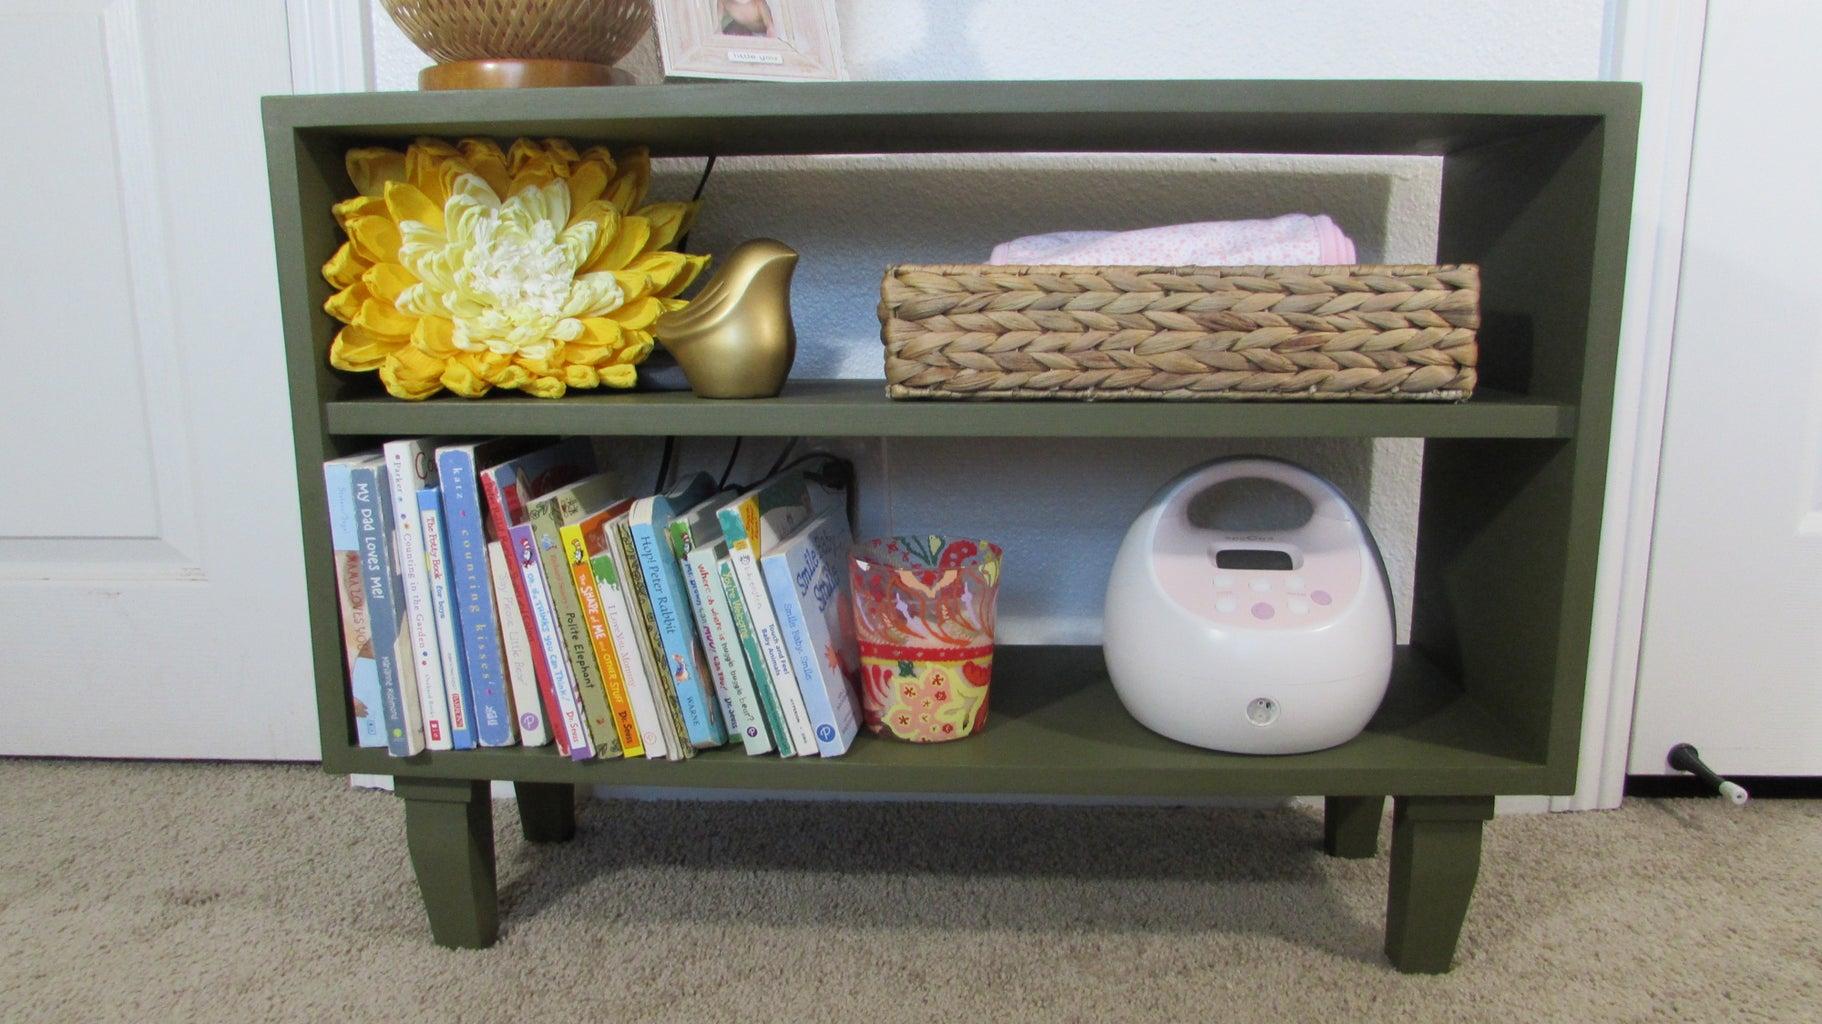 The Little Nursery Bookshelf